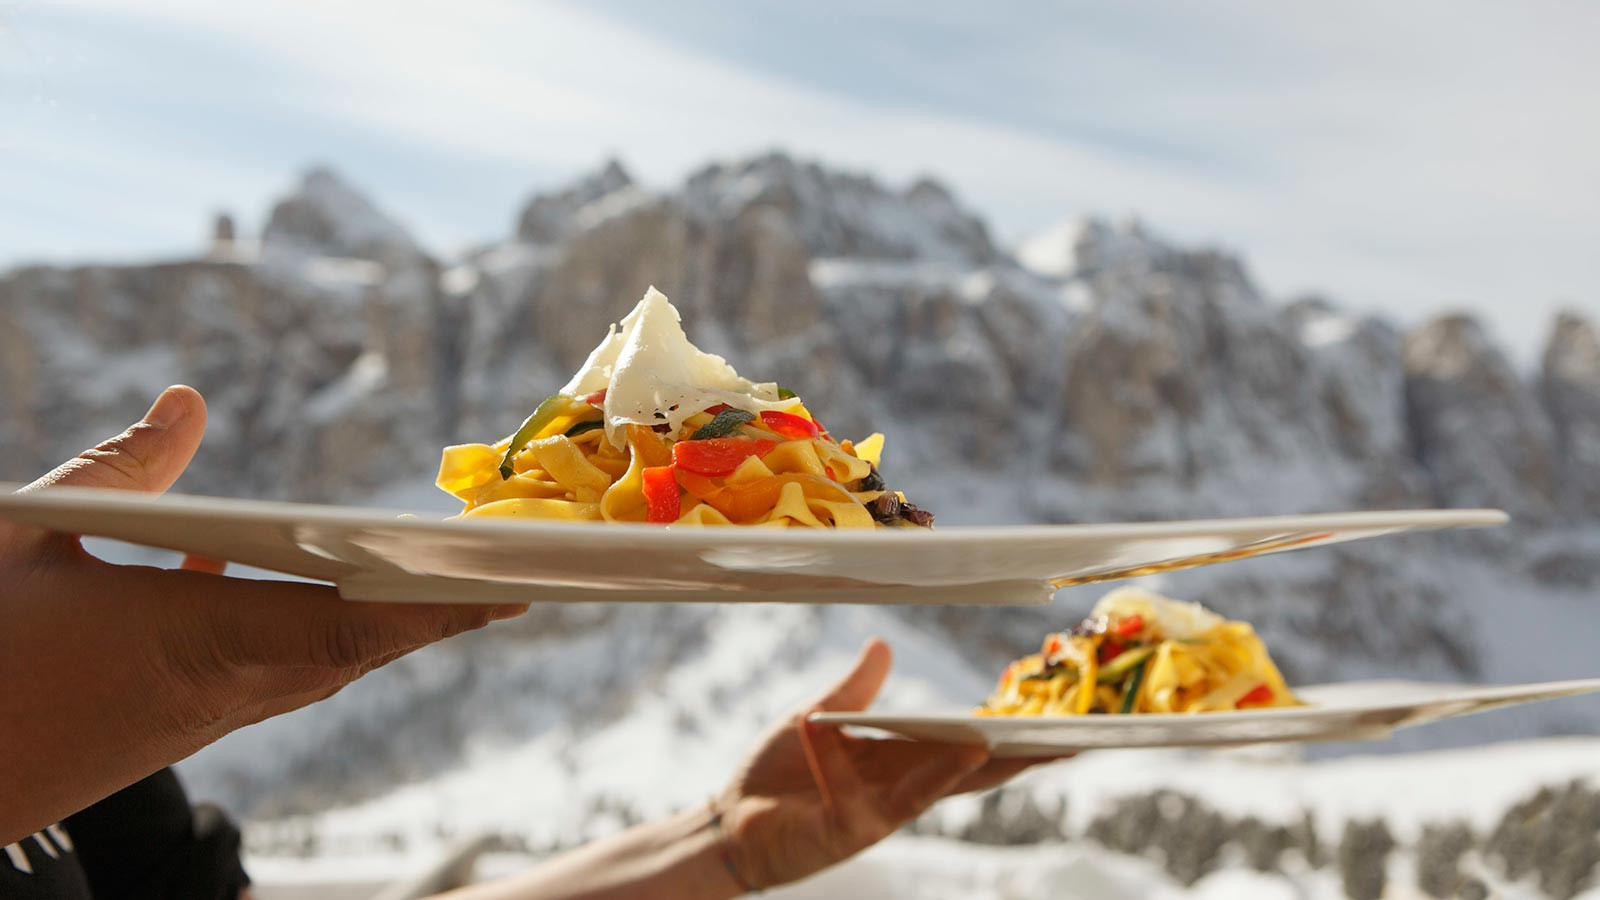 Alta Badia Food and mountains - copyright IDM Südtirol - Frieder Blickle